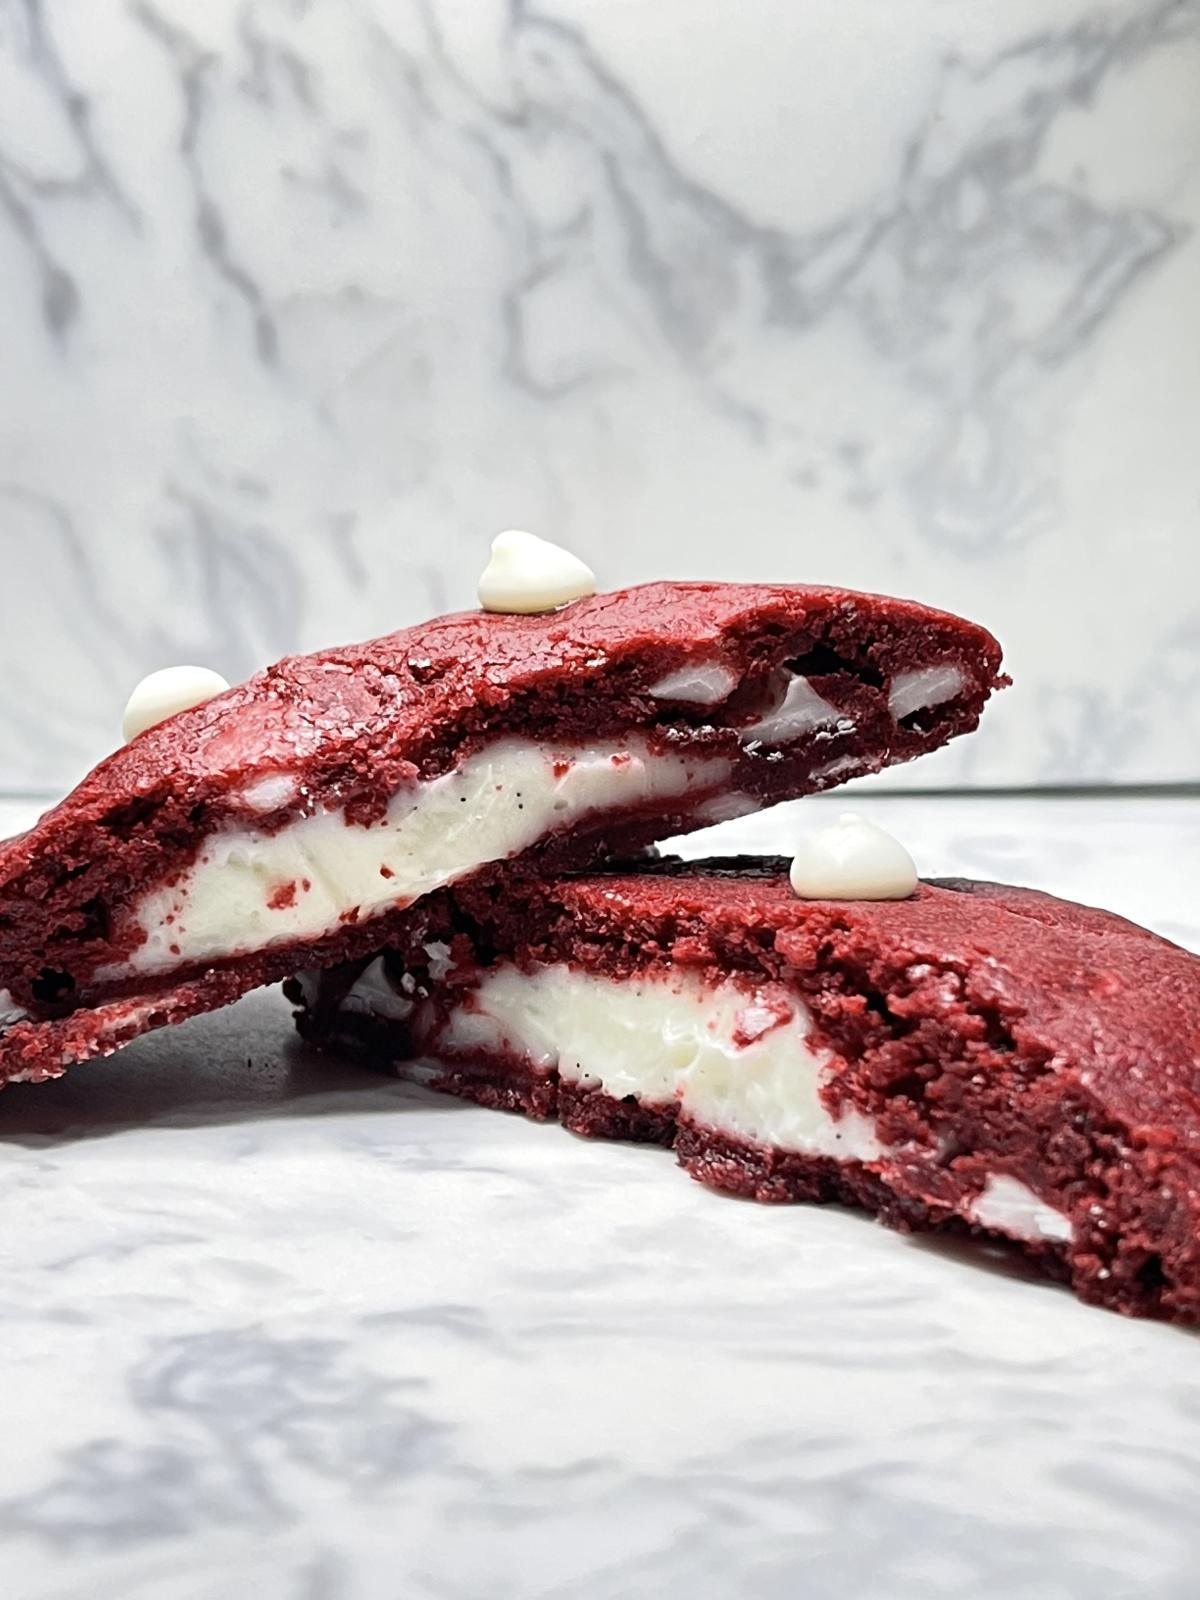 Desserty